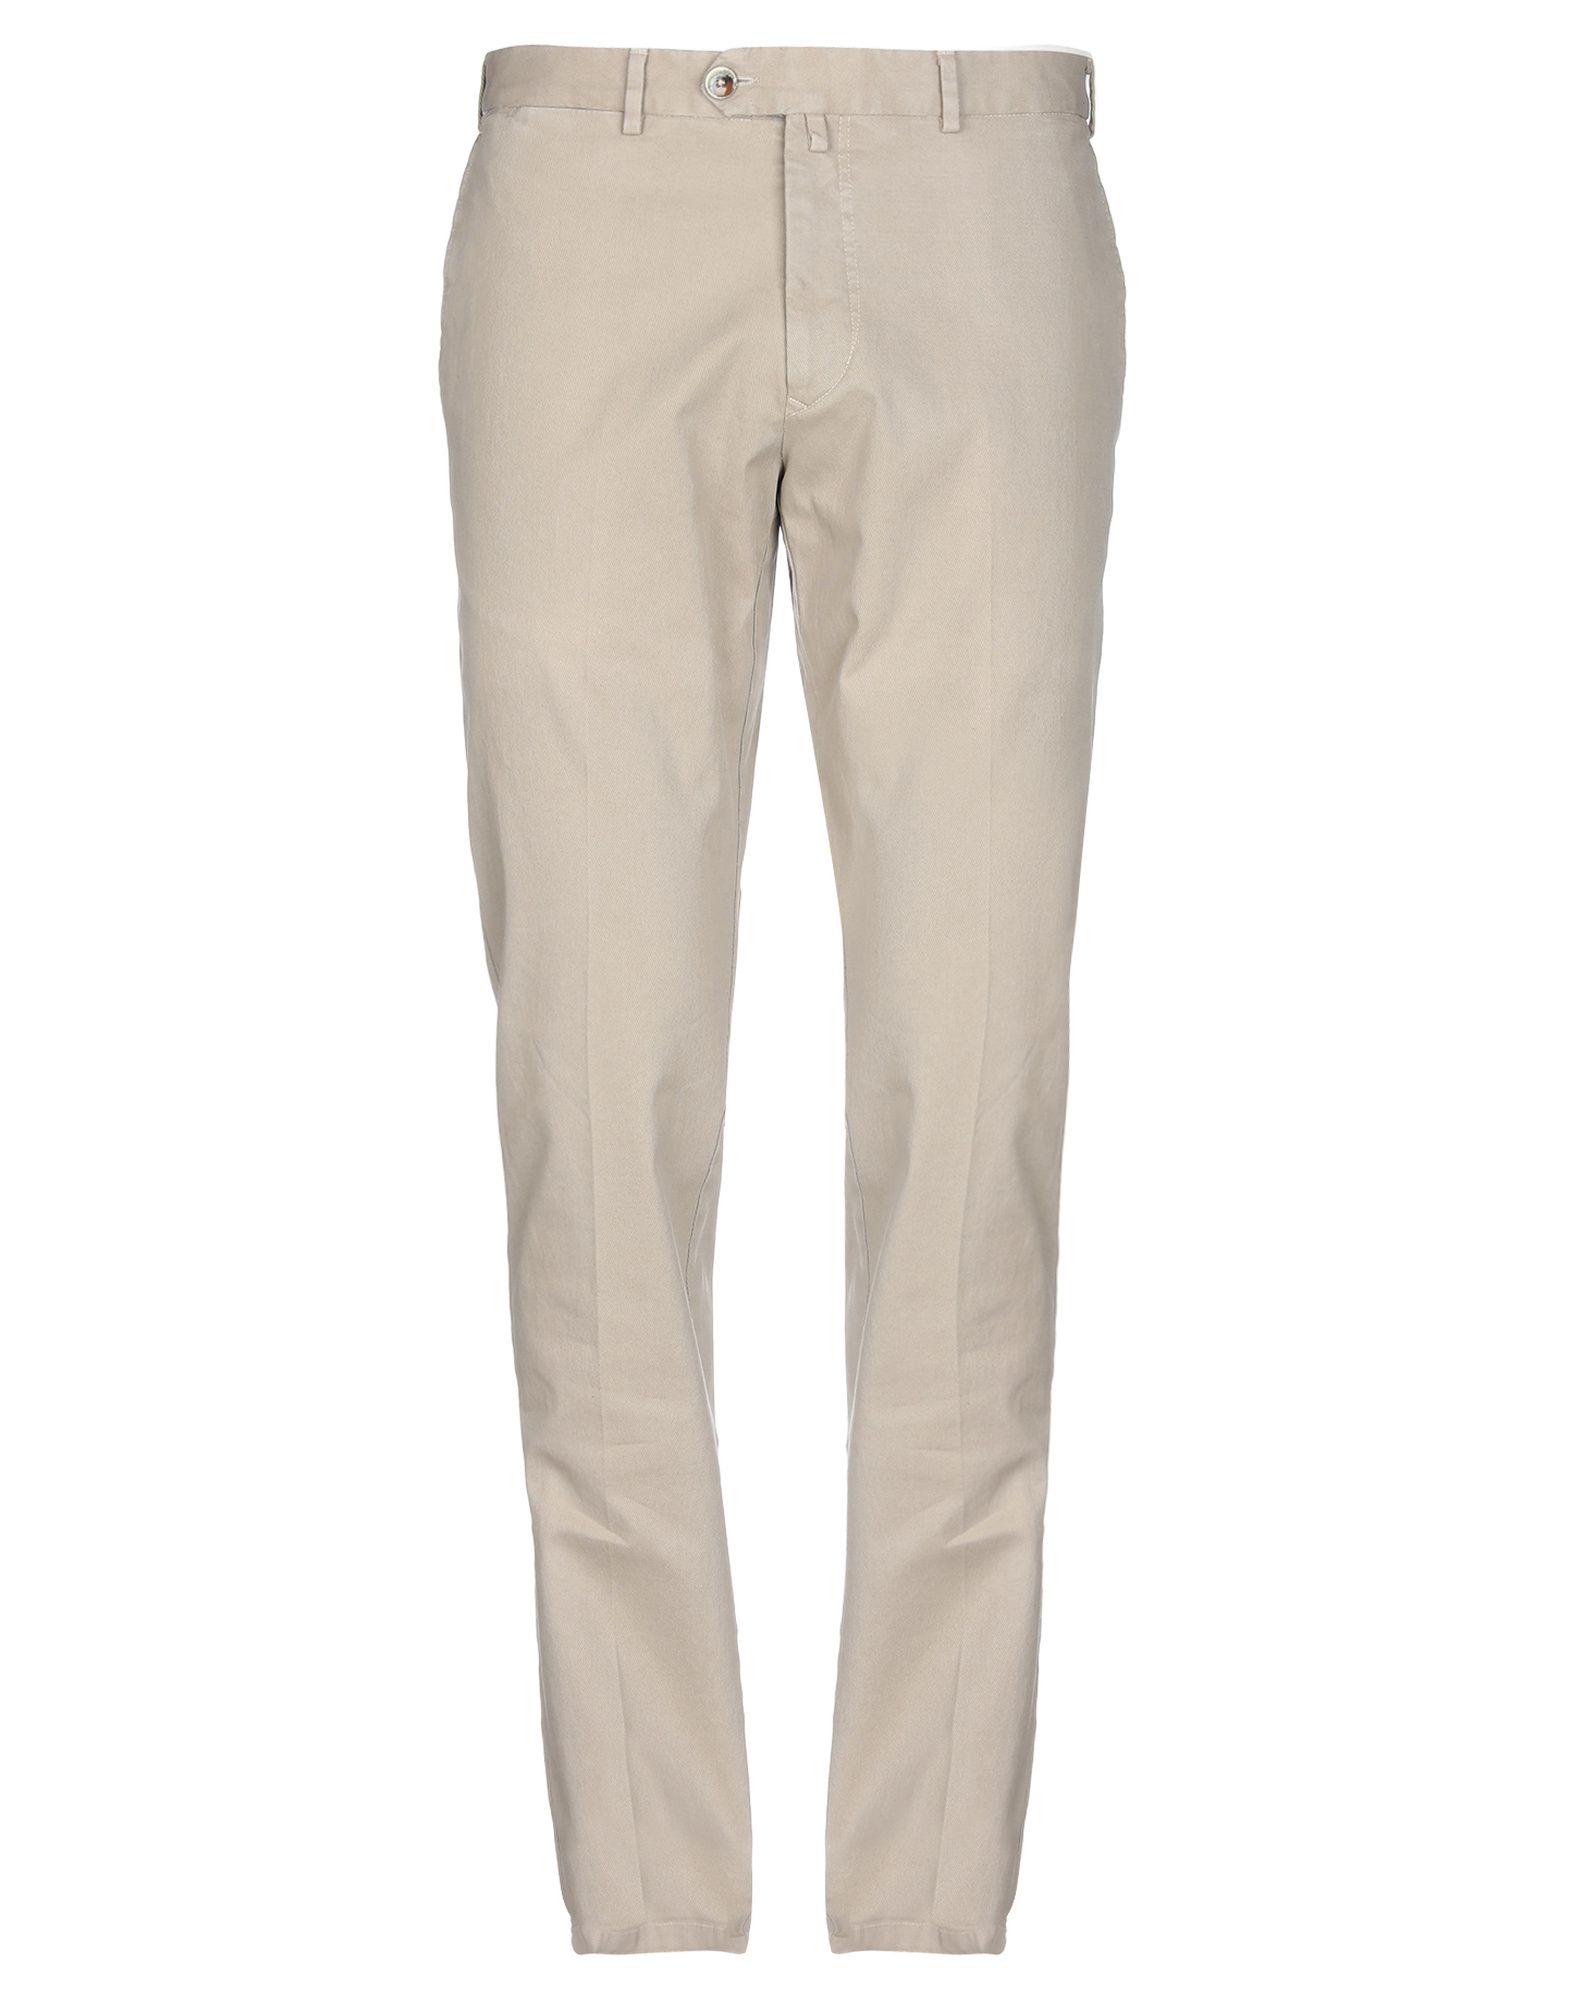 J.W. KENNEDY Повседневные брюки resin drip tip for kennedy atomizer